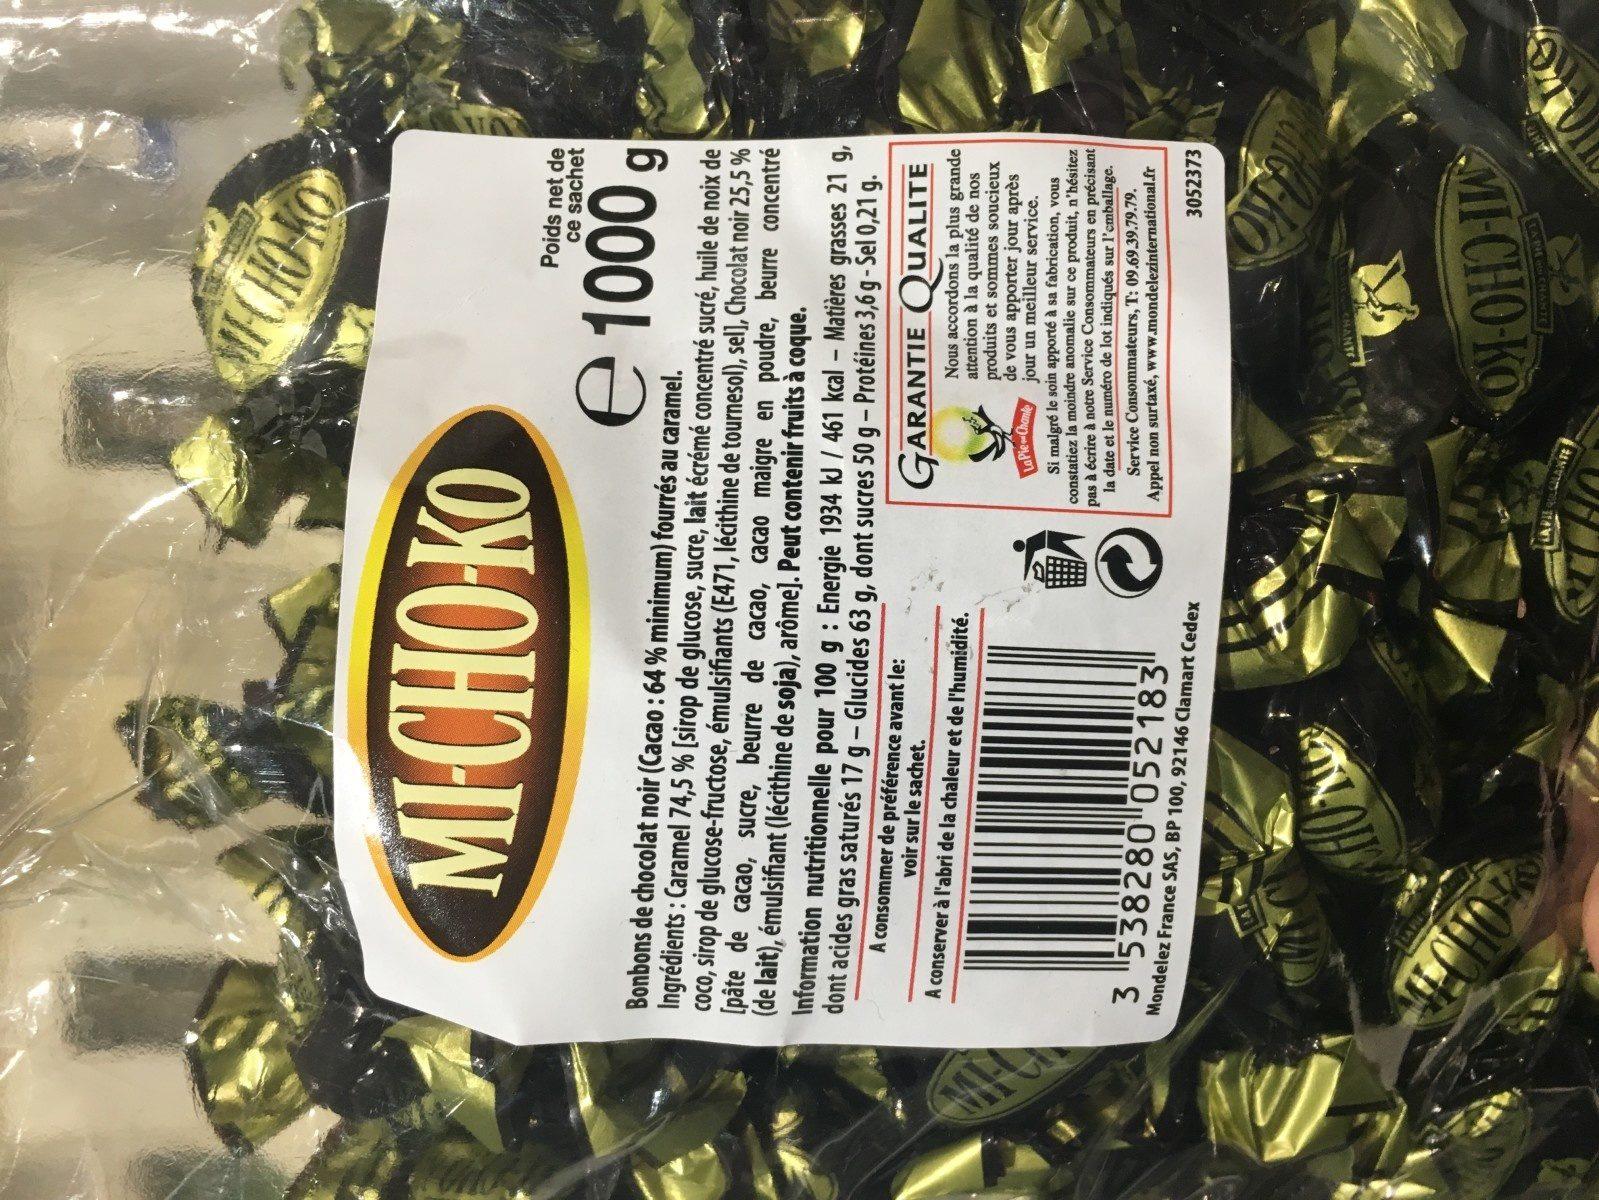 1KG Michoko Noir 64% La Pie Qui Chante - Ingrediënten - fr